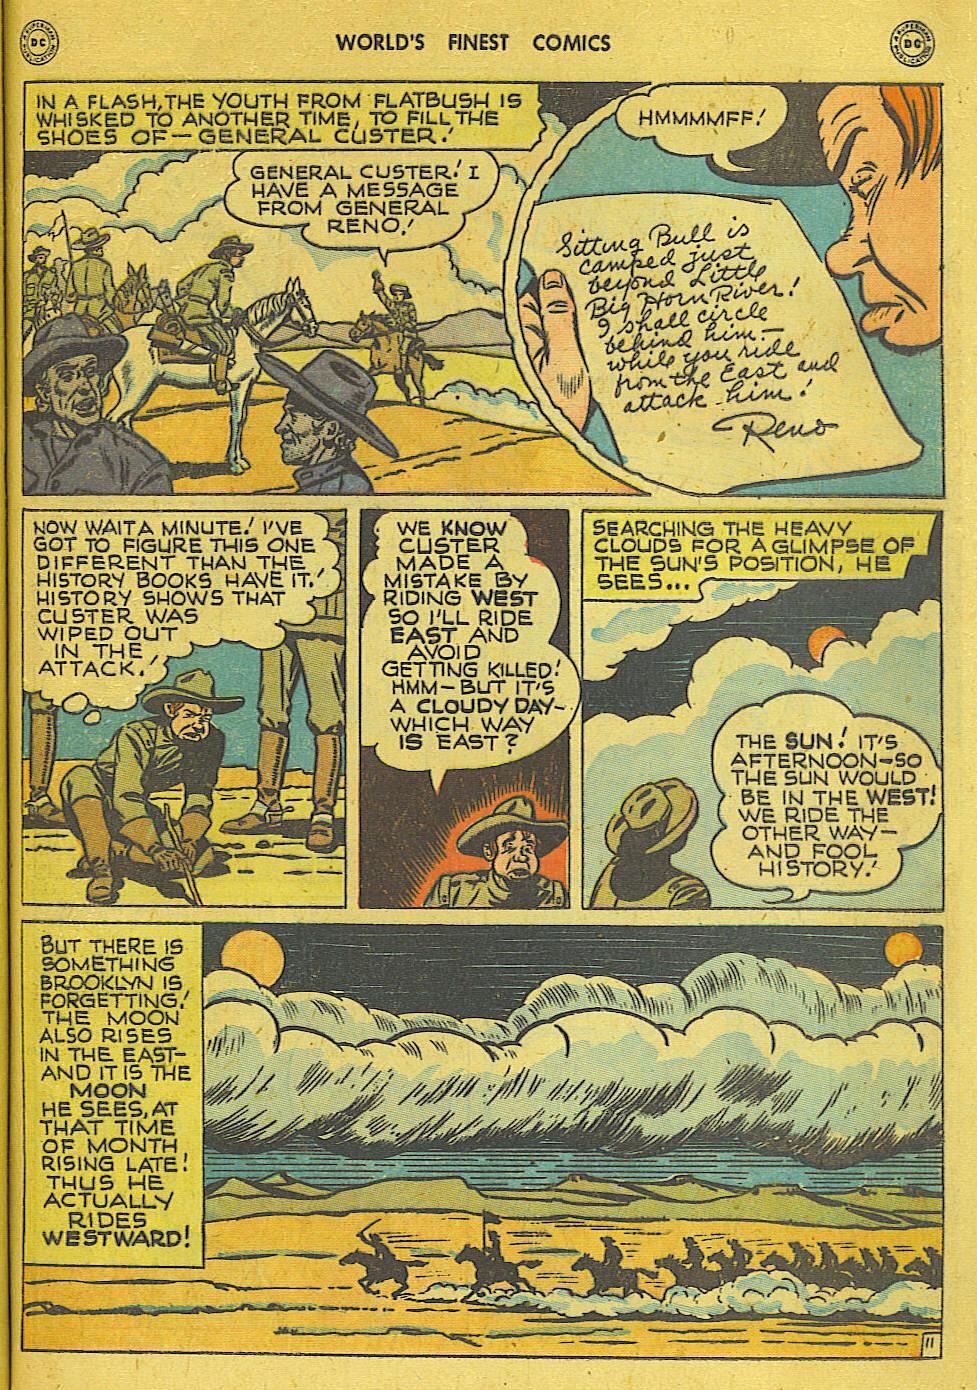 Read online World's Finest Comics comic -  Issue #34 - 37